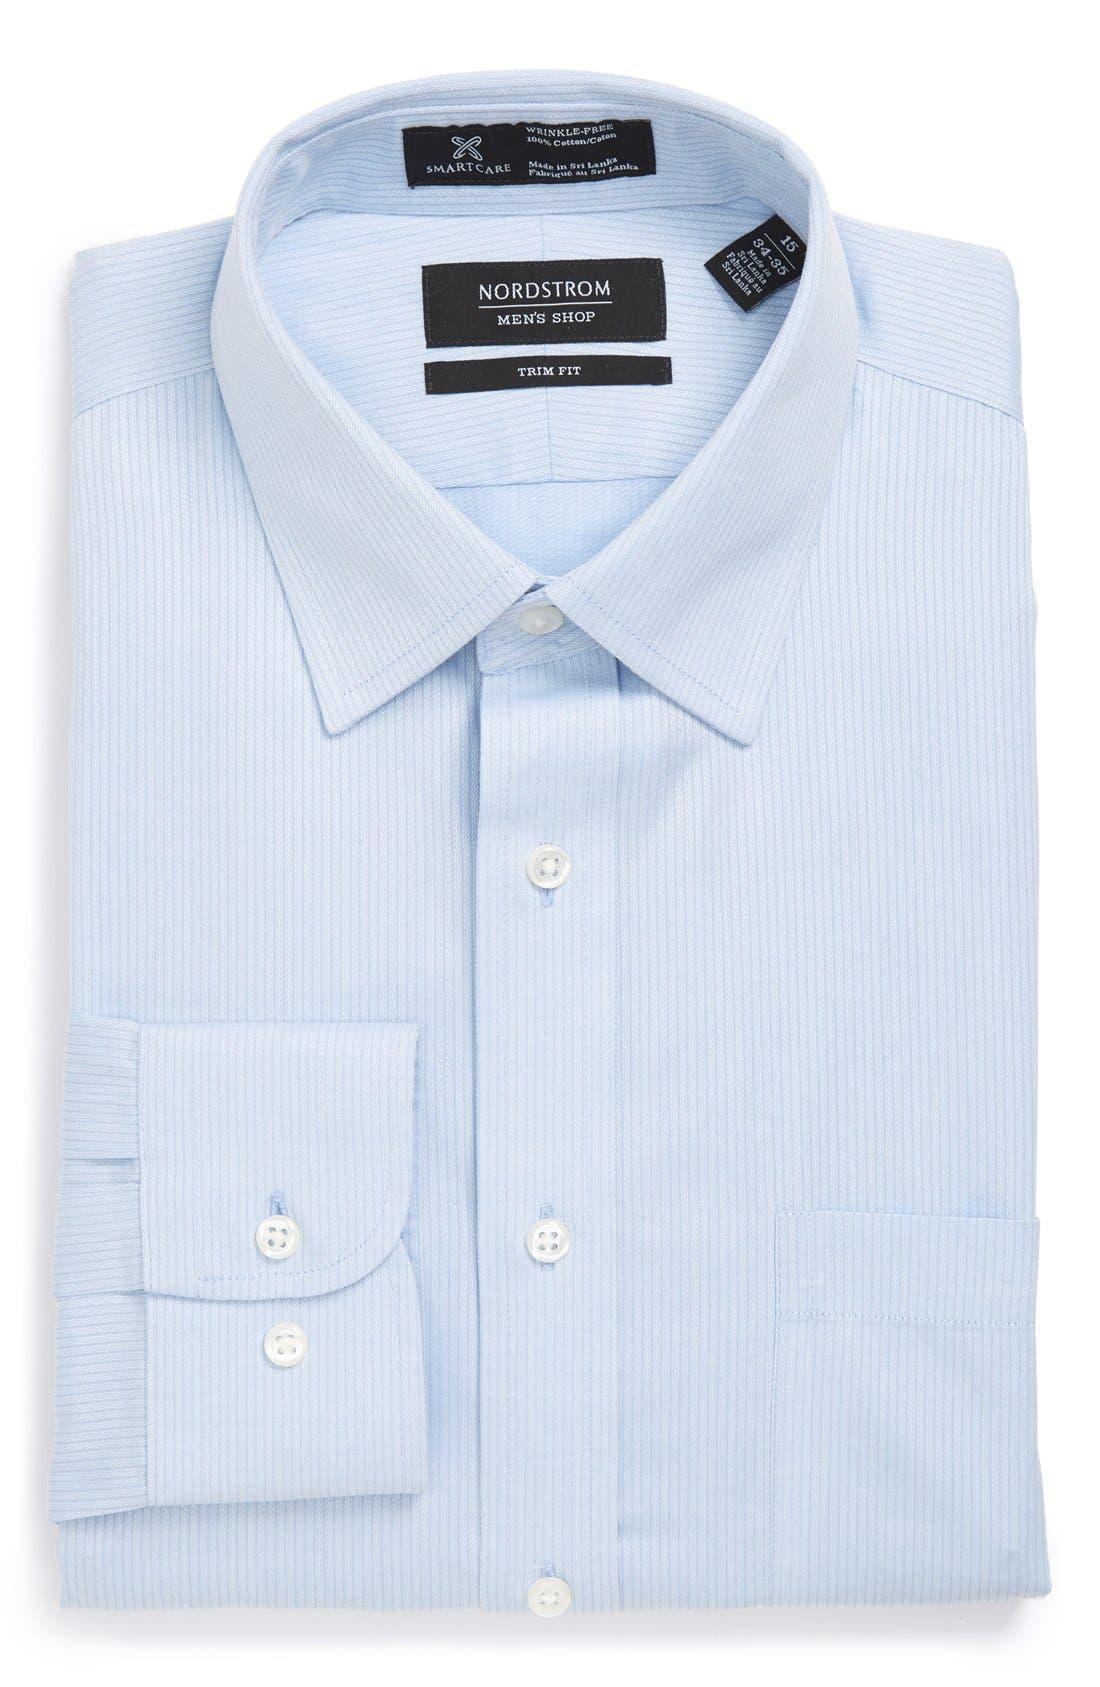 Nordstrom Menu0026#39;s Shop Smartcareu2122 Trim Fit Dress Shirt | Nordstrom